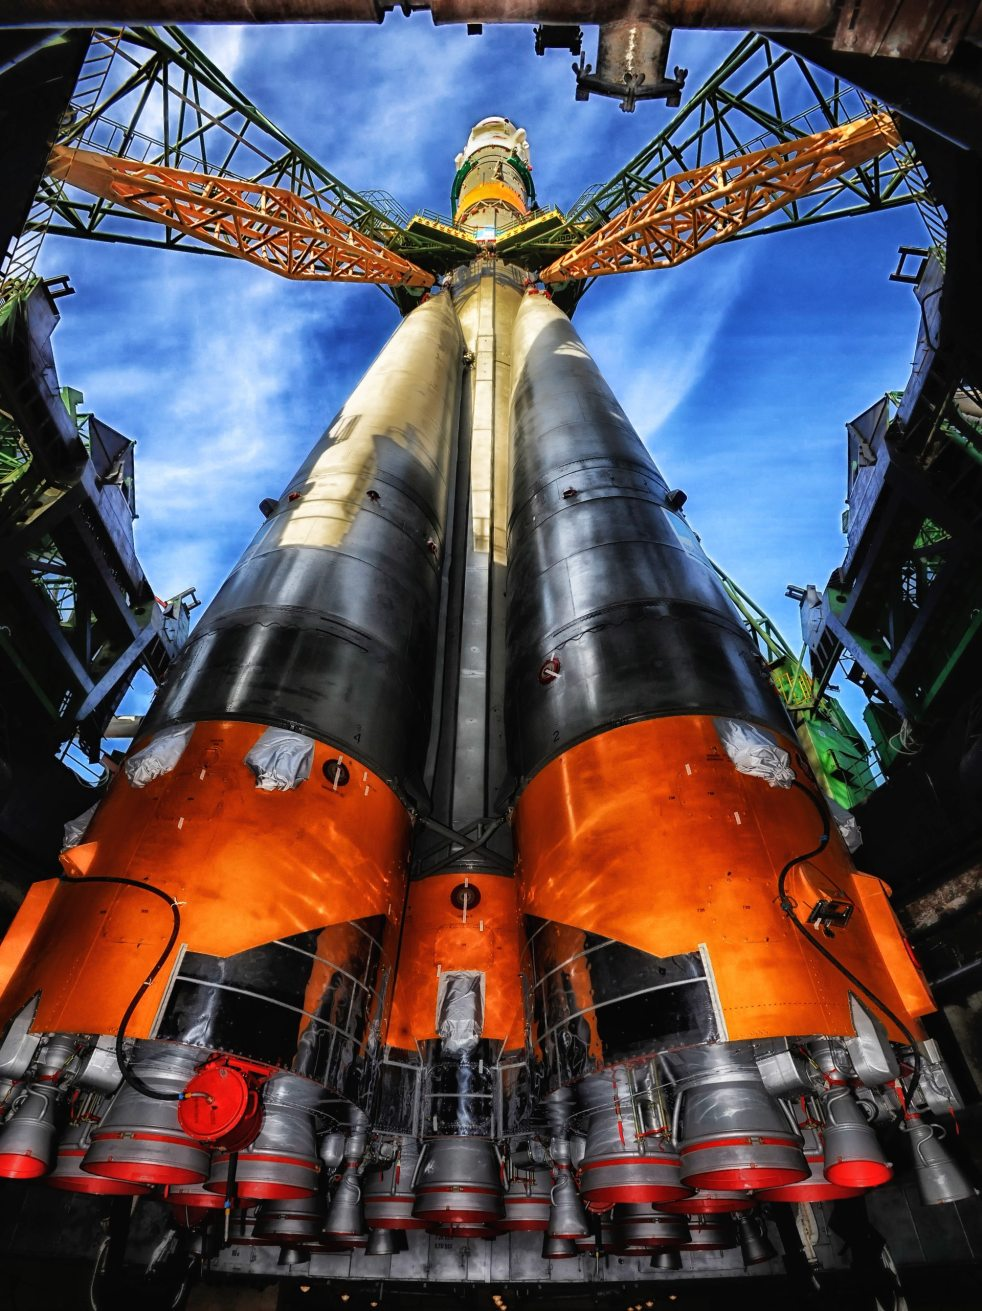 kazakhstan-soyuz-rocket-space-65704.jpeg